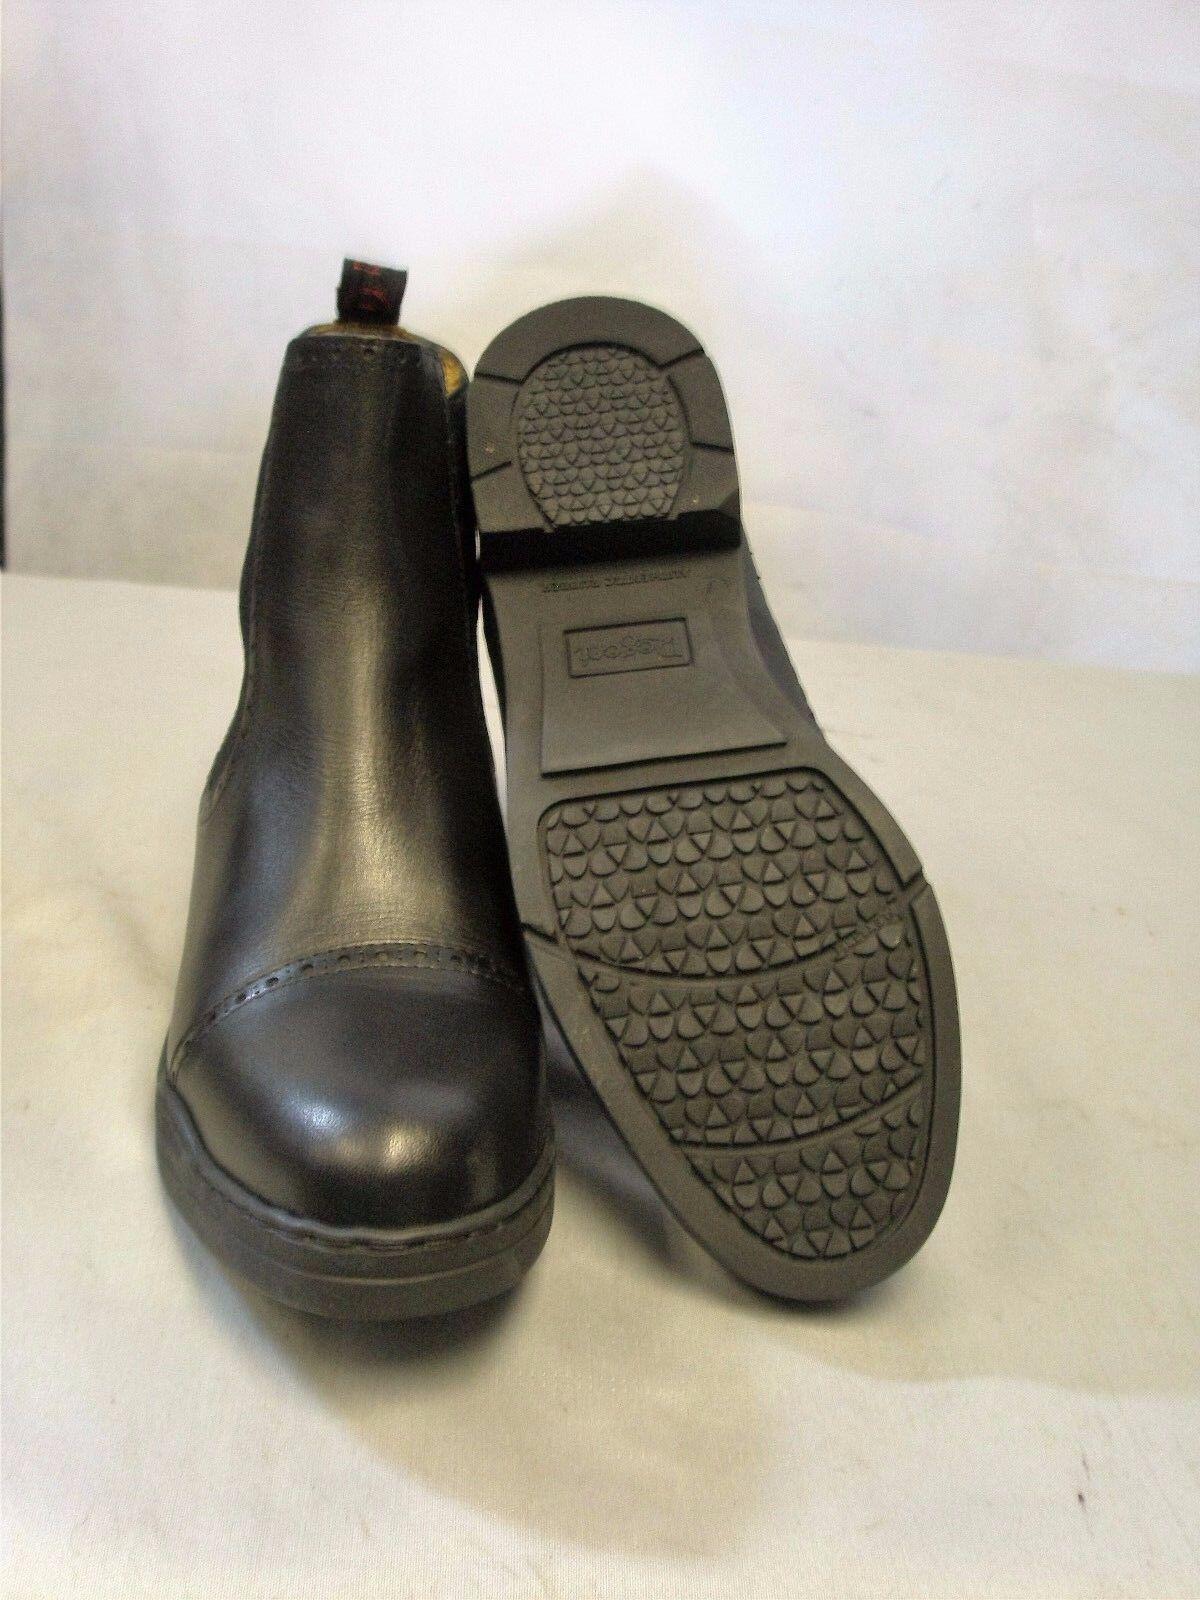 Regent Blenheim Jodhpur Stiefel (Unisex) (Unisex) Stiefel 2ec0b4